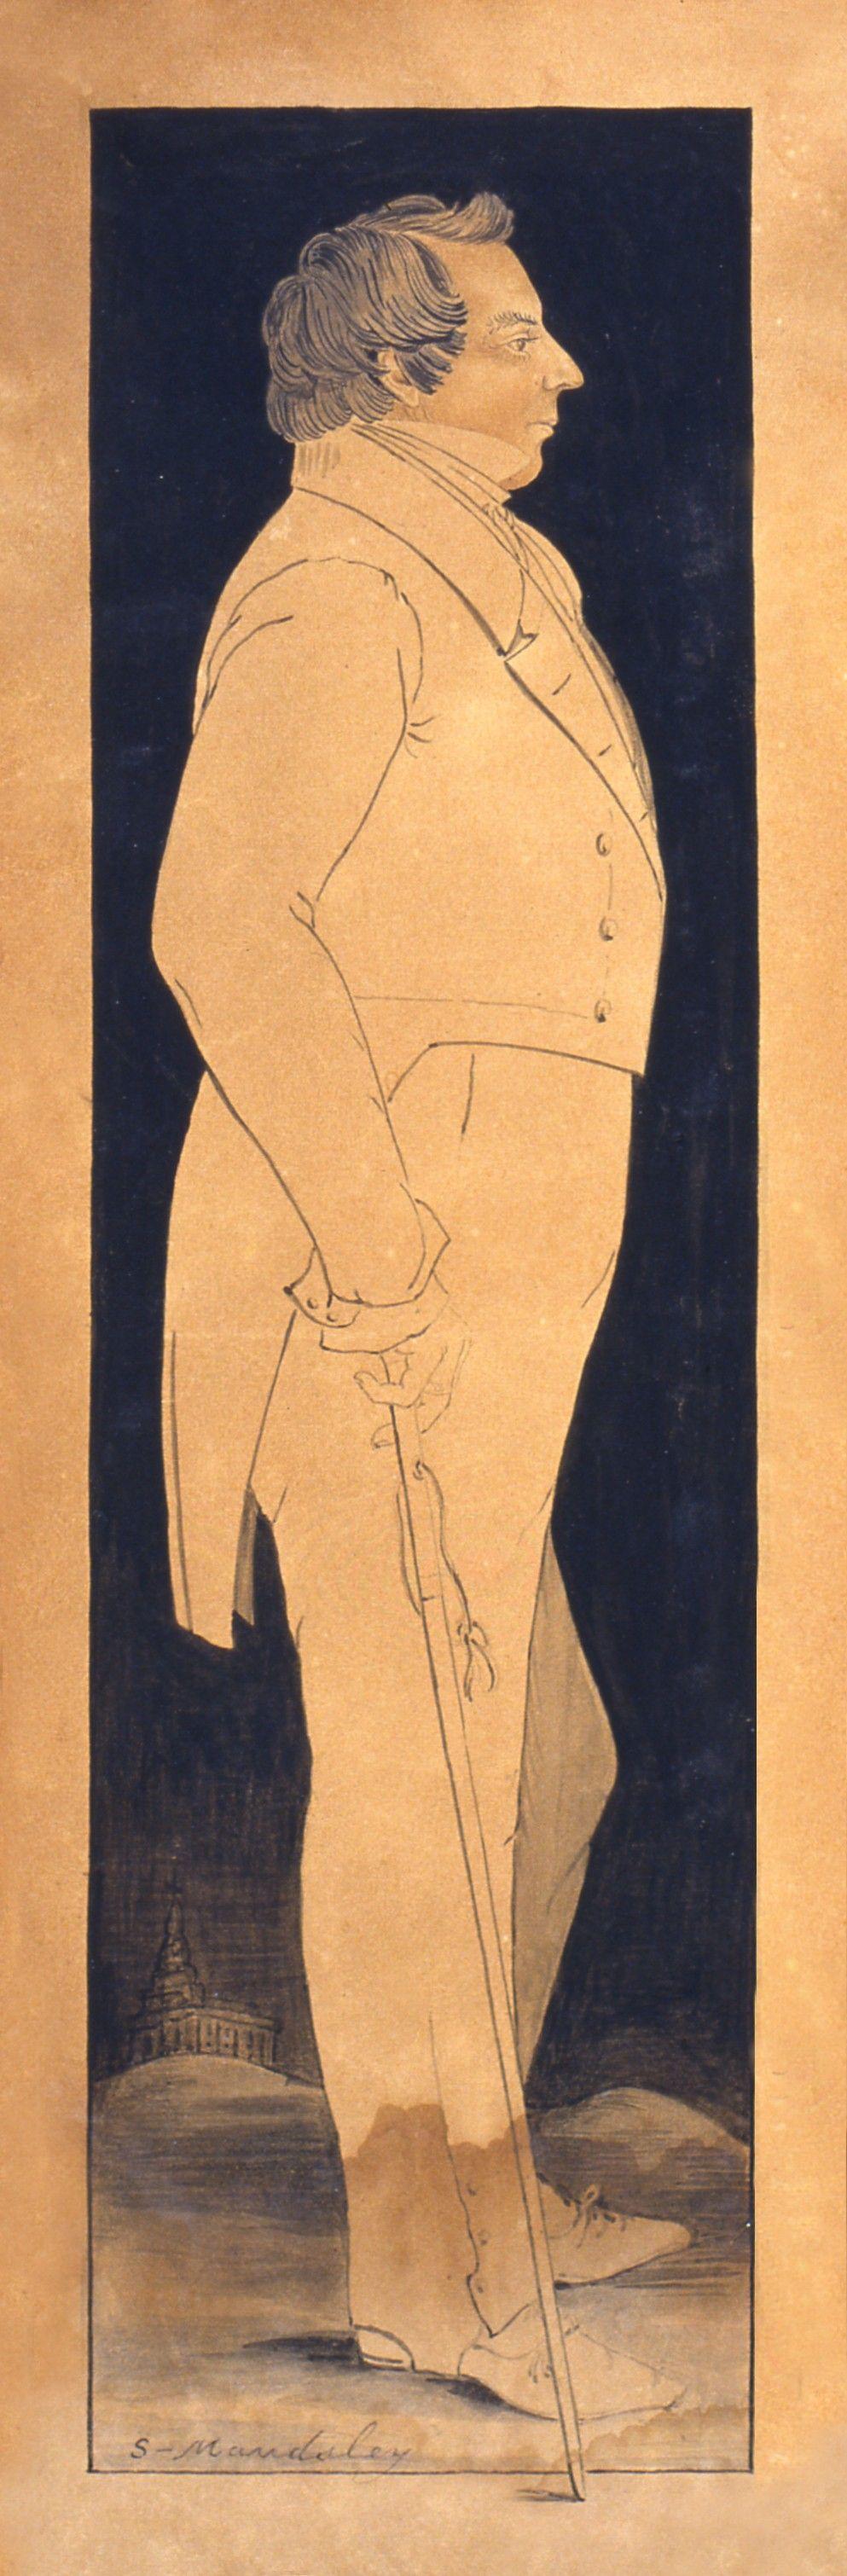 Joseph Smith, Jr., artist unknown